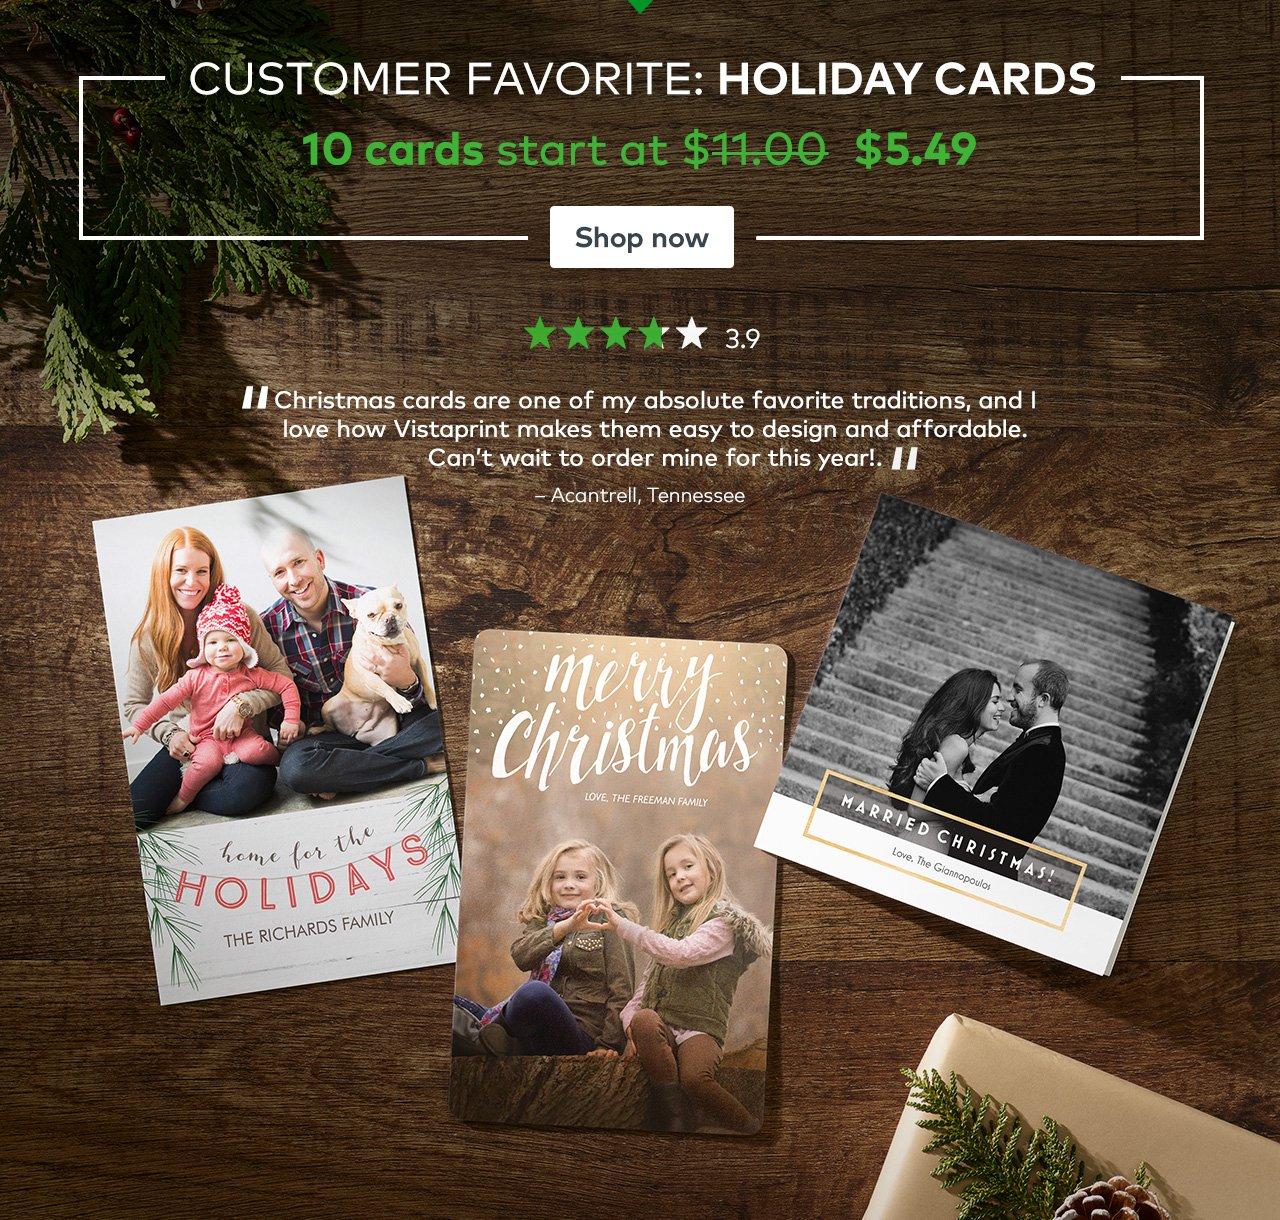 Vistaprint: Save on Customer Favorites | holiday cards, custom gifts ...